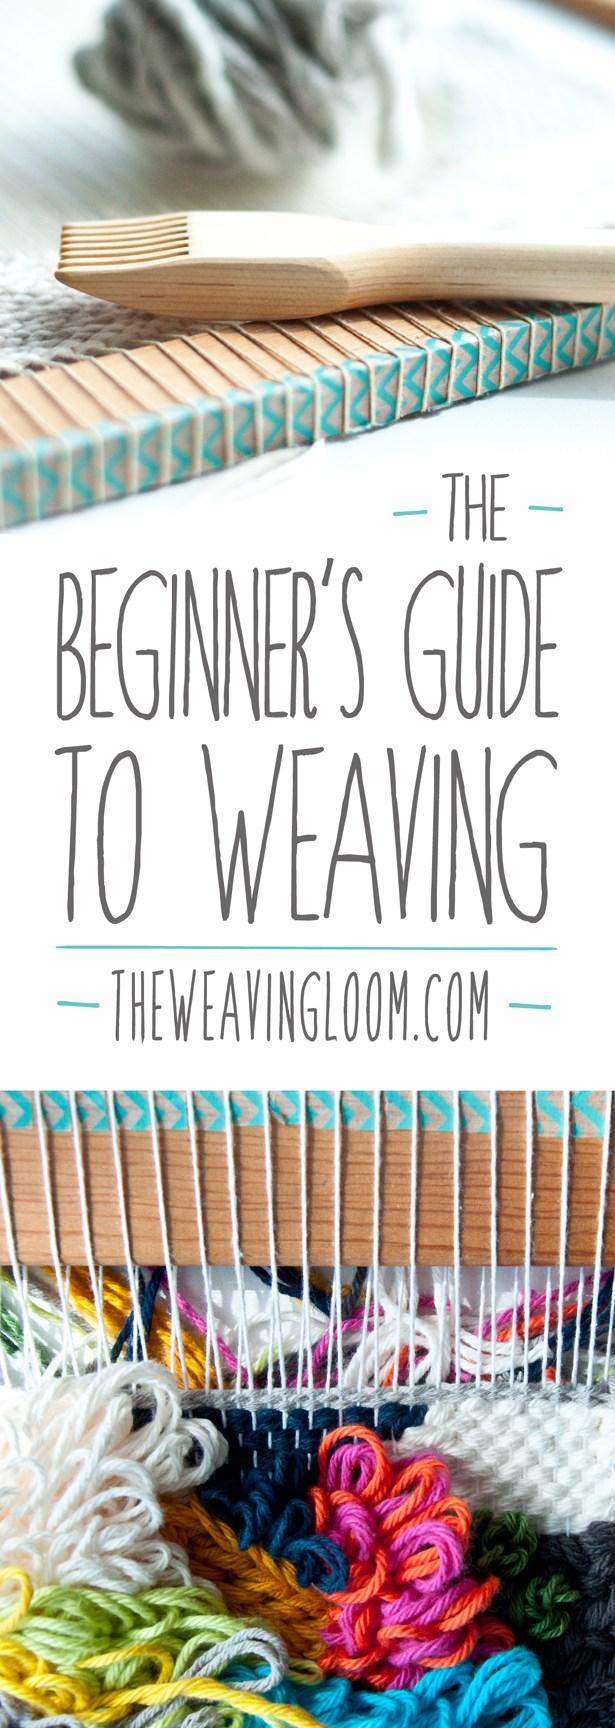 Kate, the Weaving Loom // Beginner's Guide to Weaving